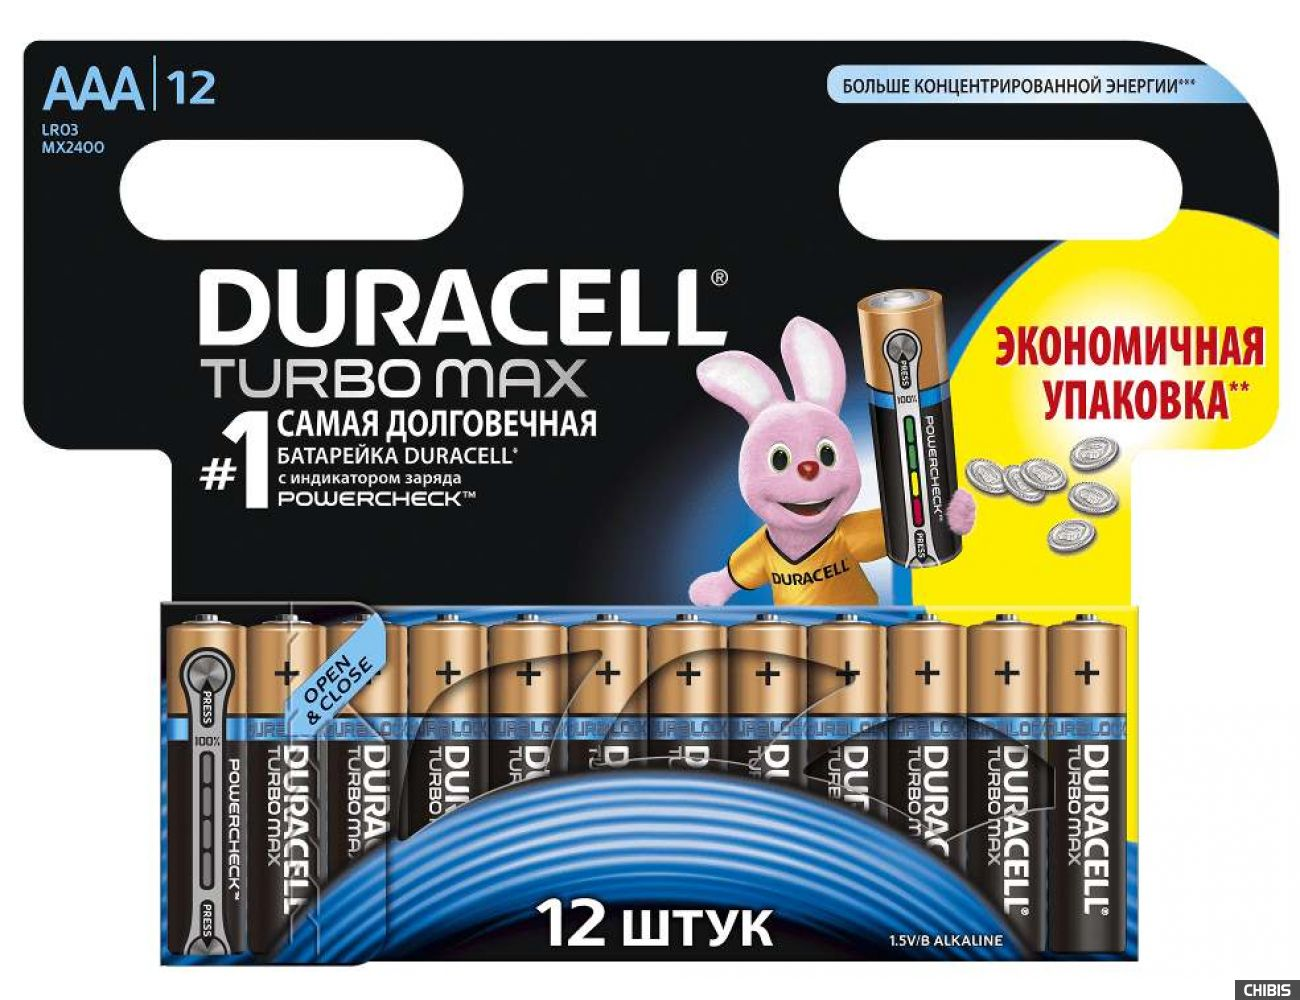 Батарейка ААА Duracell Turbo Max LR03 1.5V Alkaline 1/12 шт.